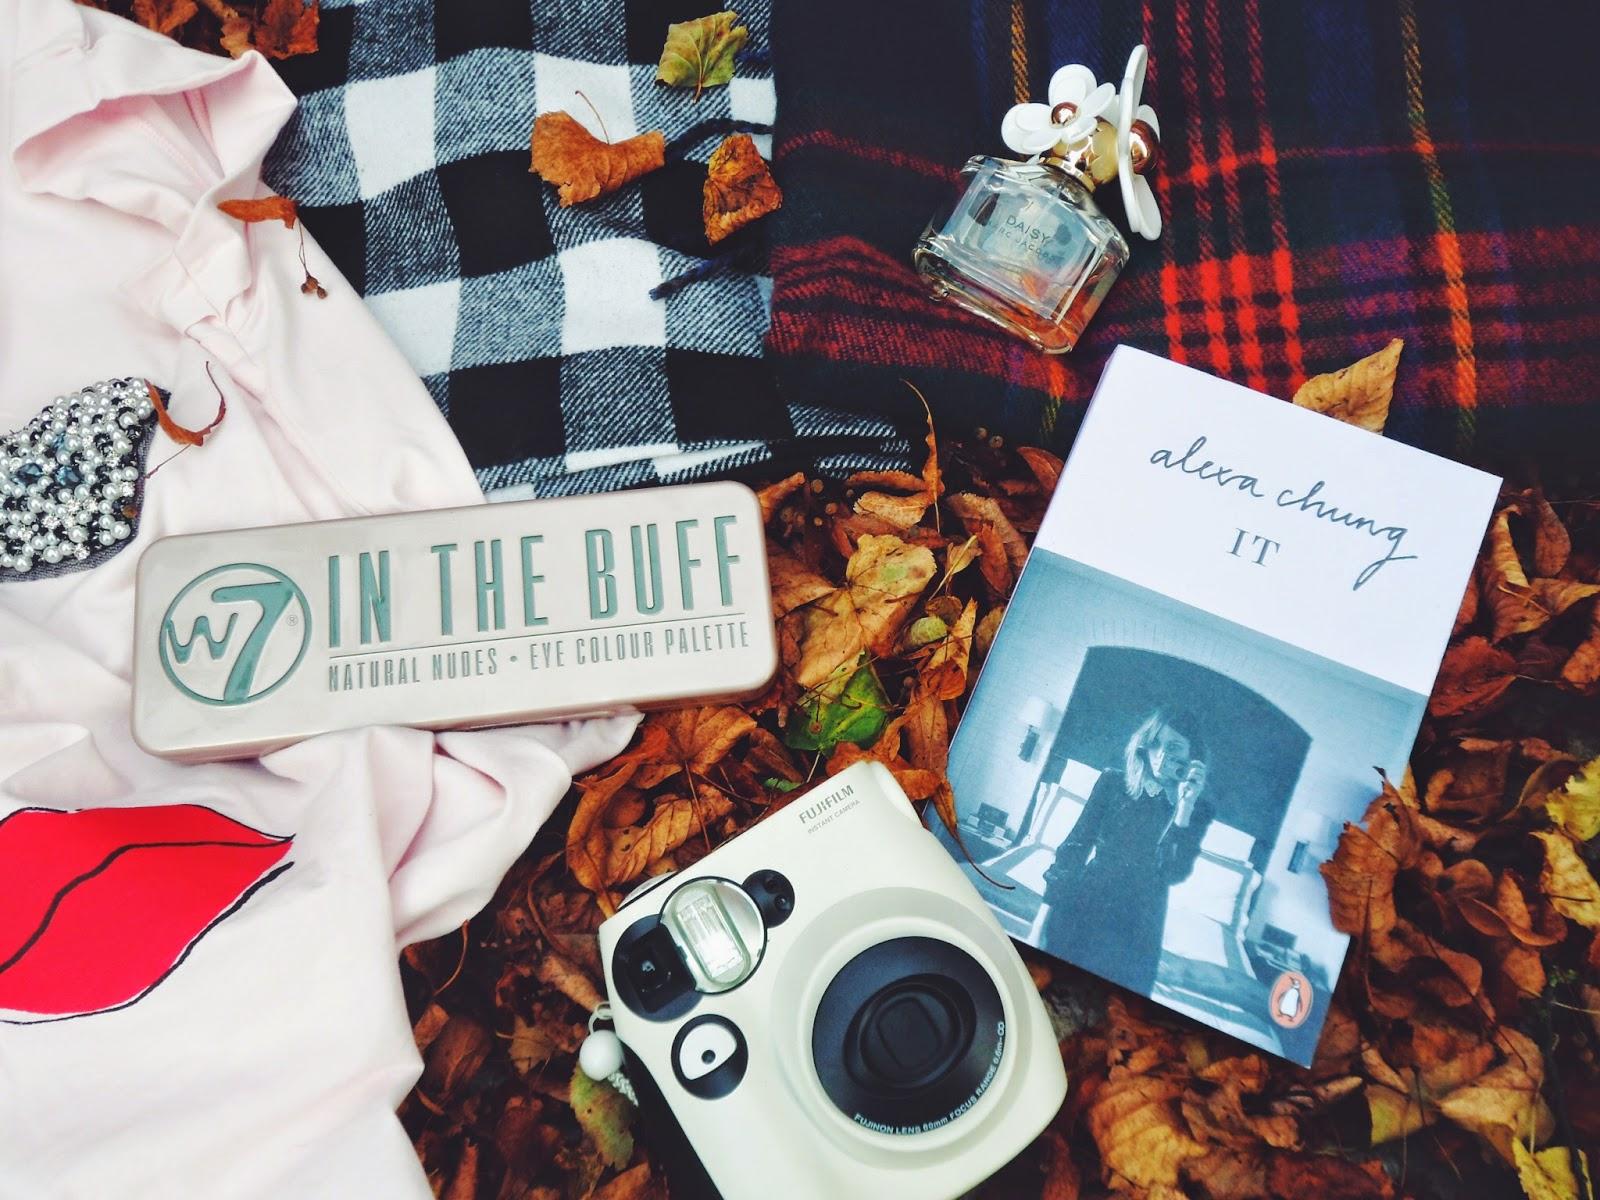 autumn, autumnfavourites, fashion, fbloggers, fashionbloggers, lotd, lookoftheday, ootd, outfitoftheday, whatibought, whatimwearing, riverisland, alexachung, w7inthebuff, polaroidcamera, matalan, daisy, marcjacobsdaisy, tartan, primark